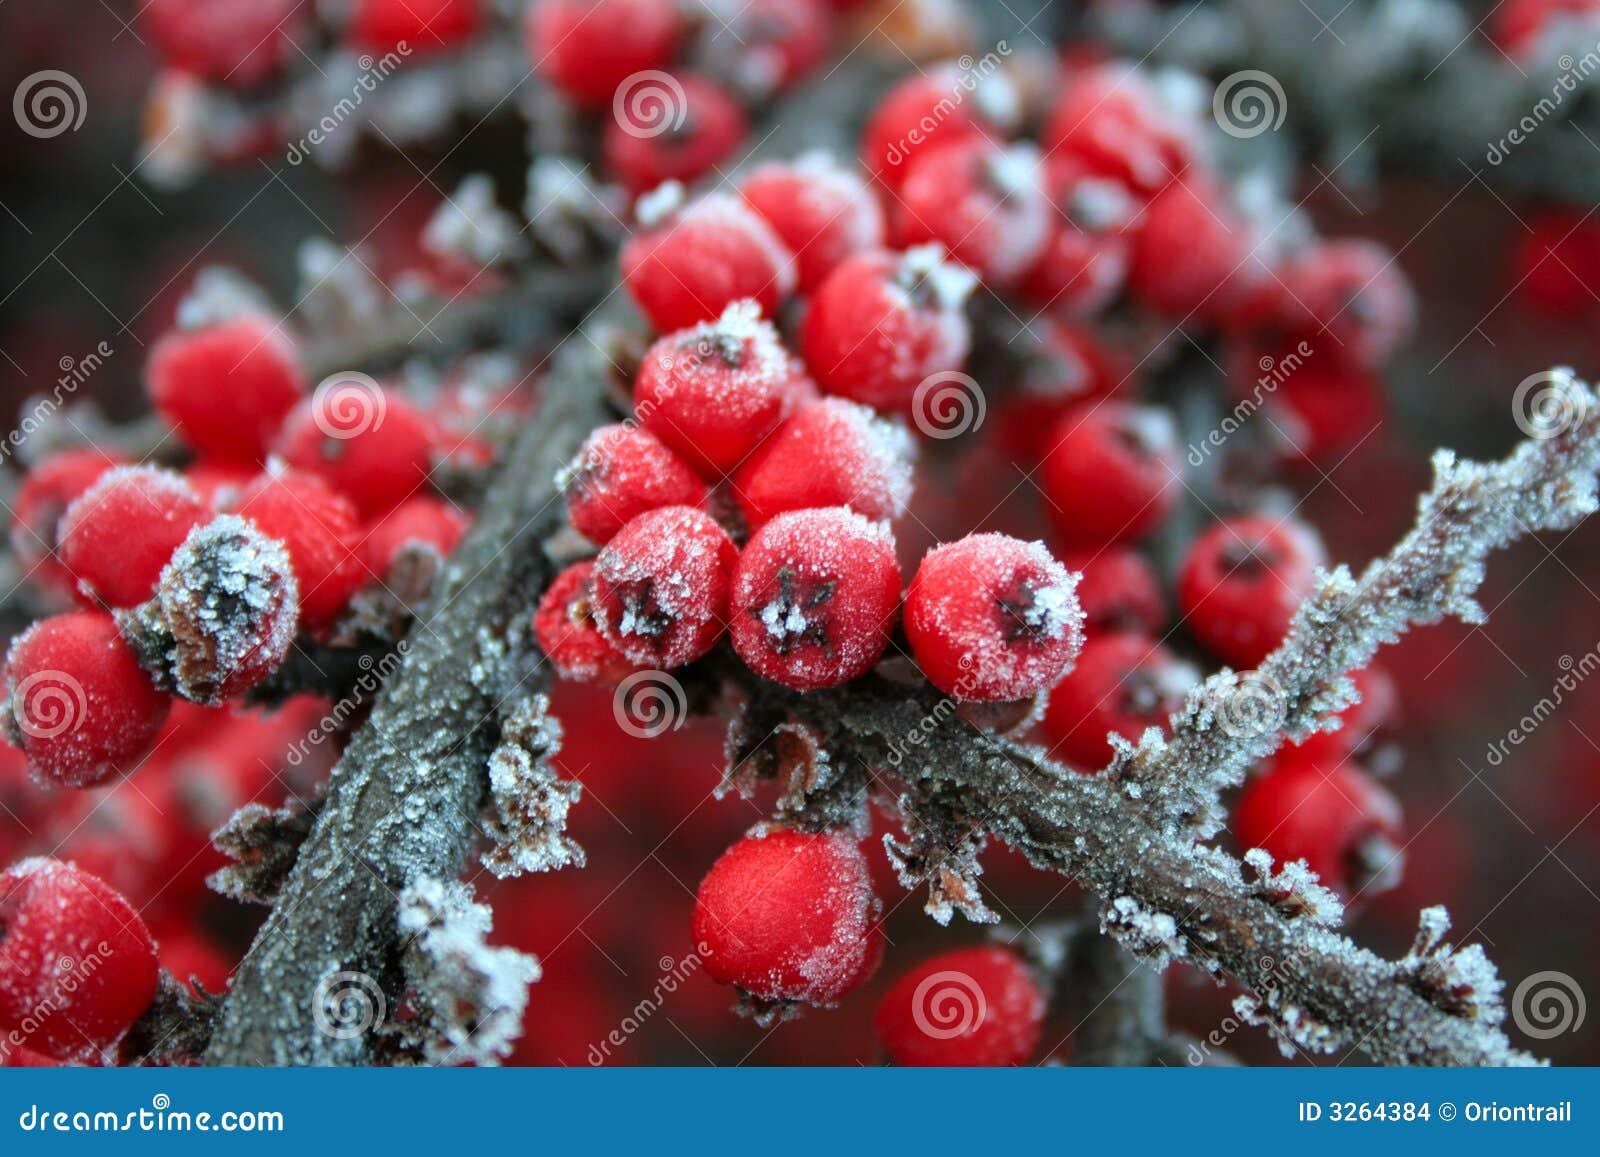 rote gefrorene beeren stockbilder bild 3264384. Black Bedroom Furniture Sets. Home Design Ideas